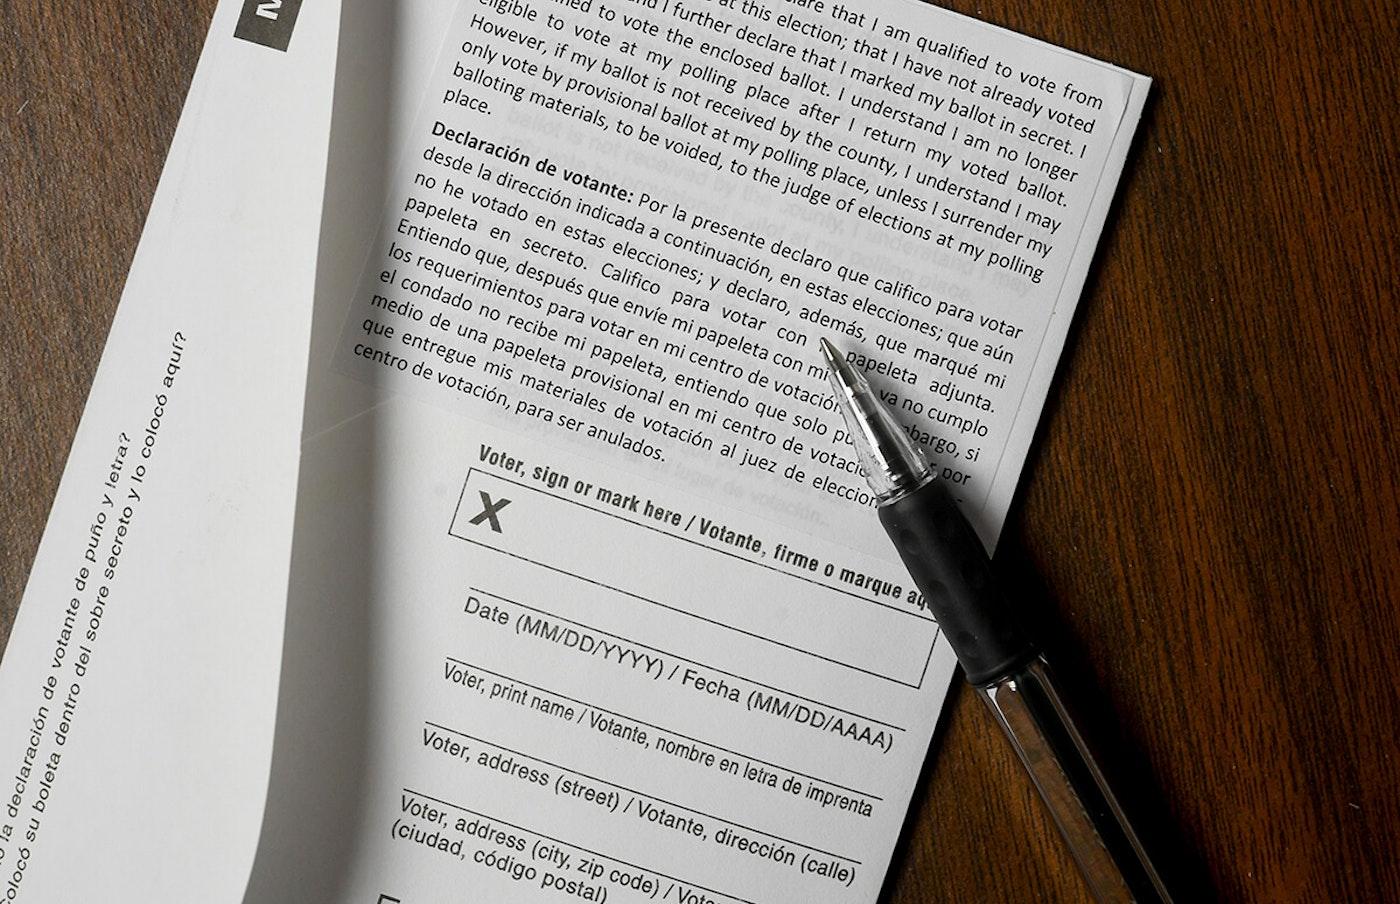 close-up up place for signature on ballot affidavit